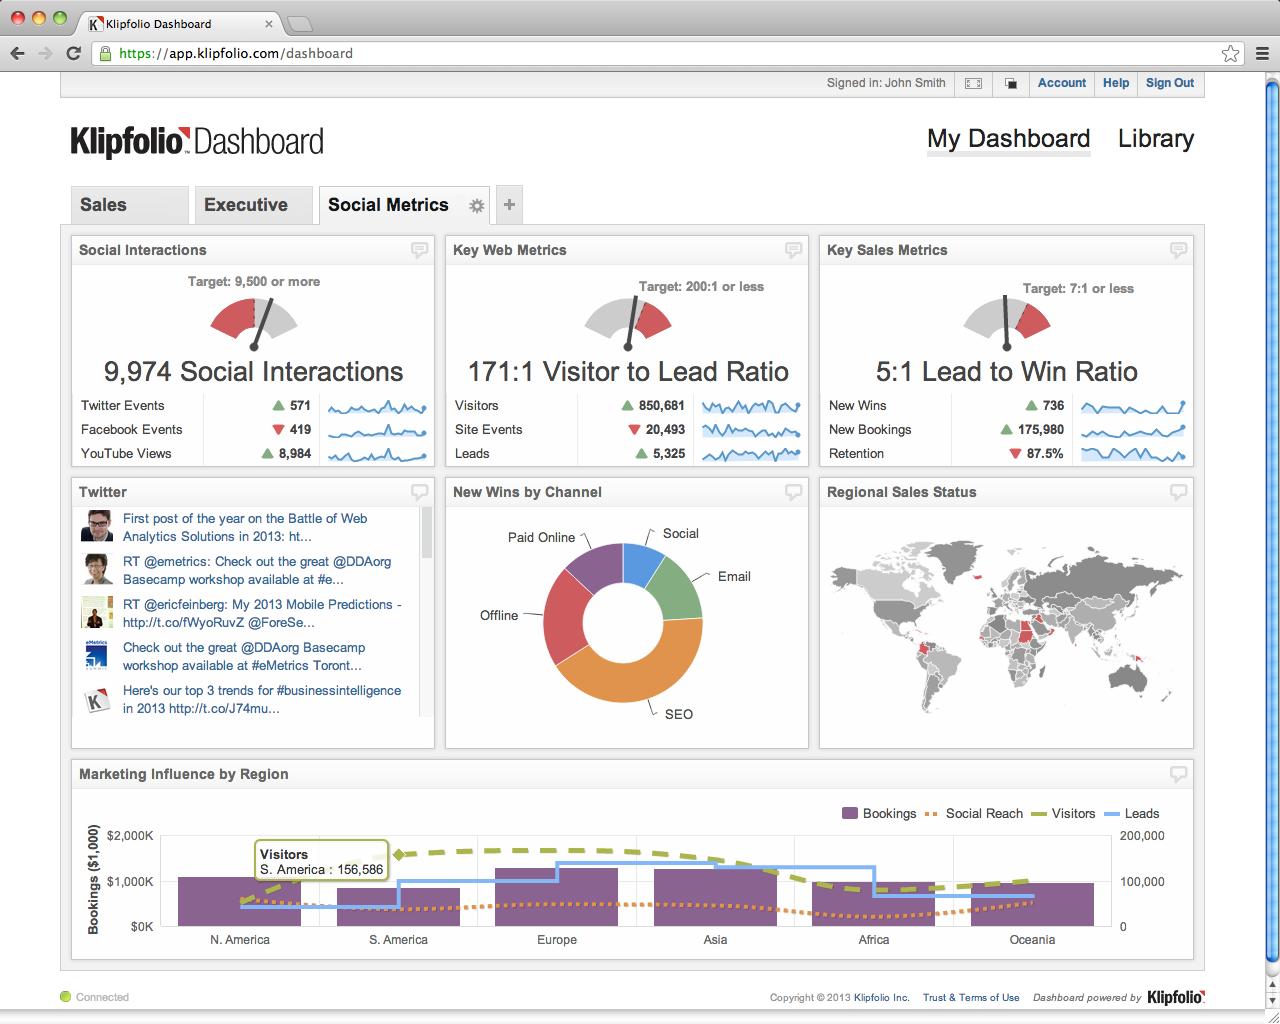 klipfolio2 Sample Application Response Performance Dashboard on